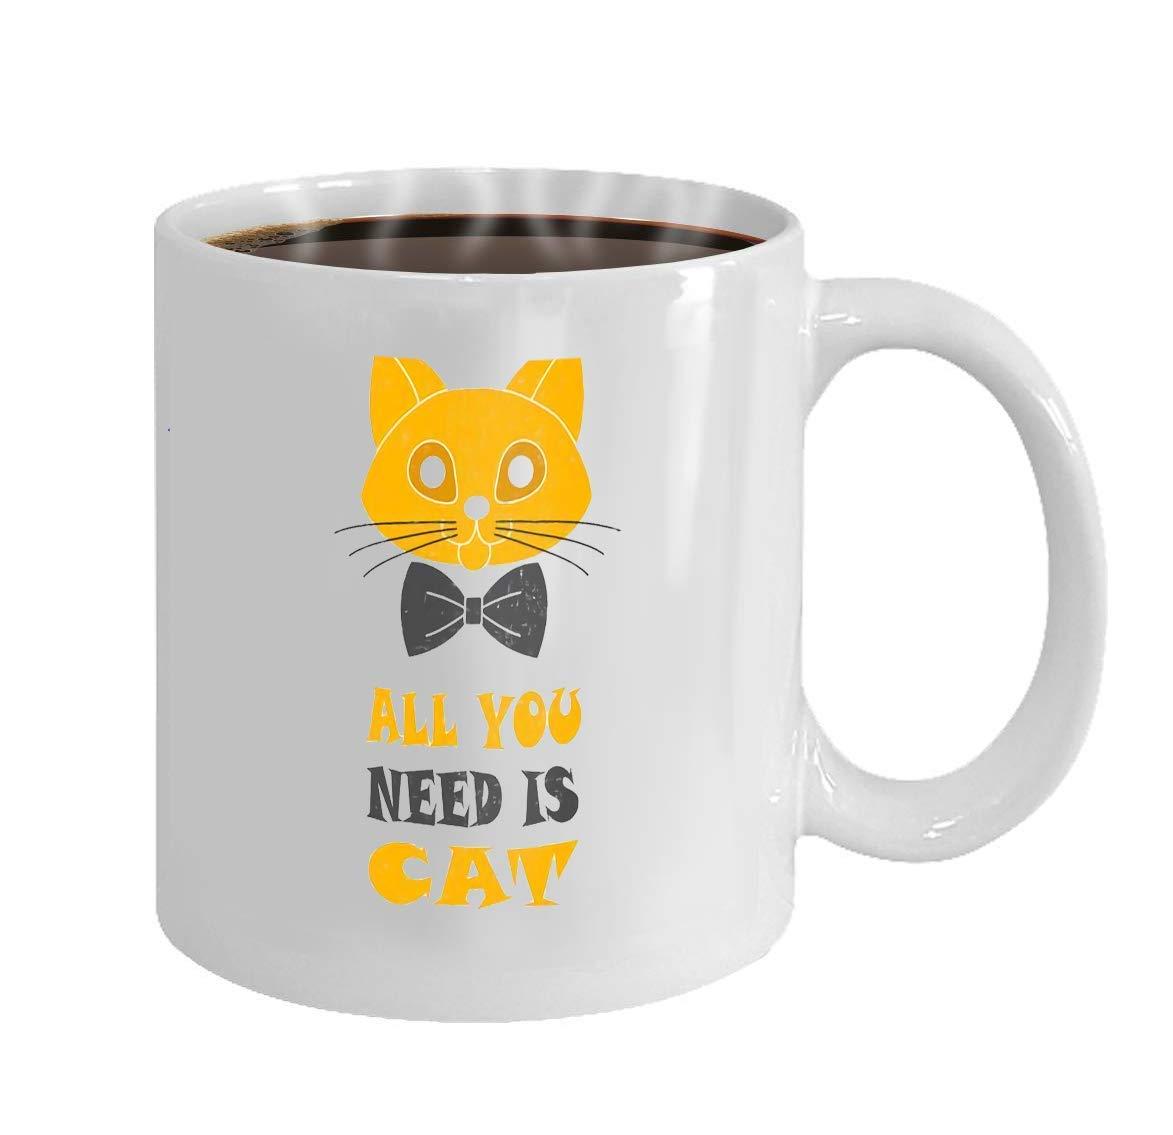 Wistty Taza de café Taza de Regalo Cara de Gato con Corbata y Cita ...